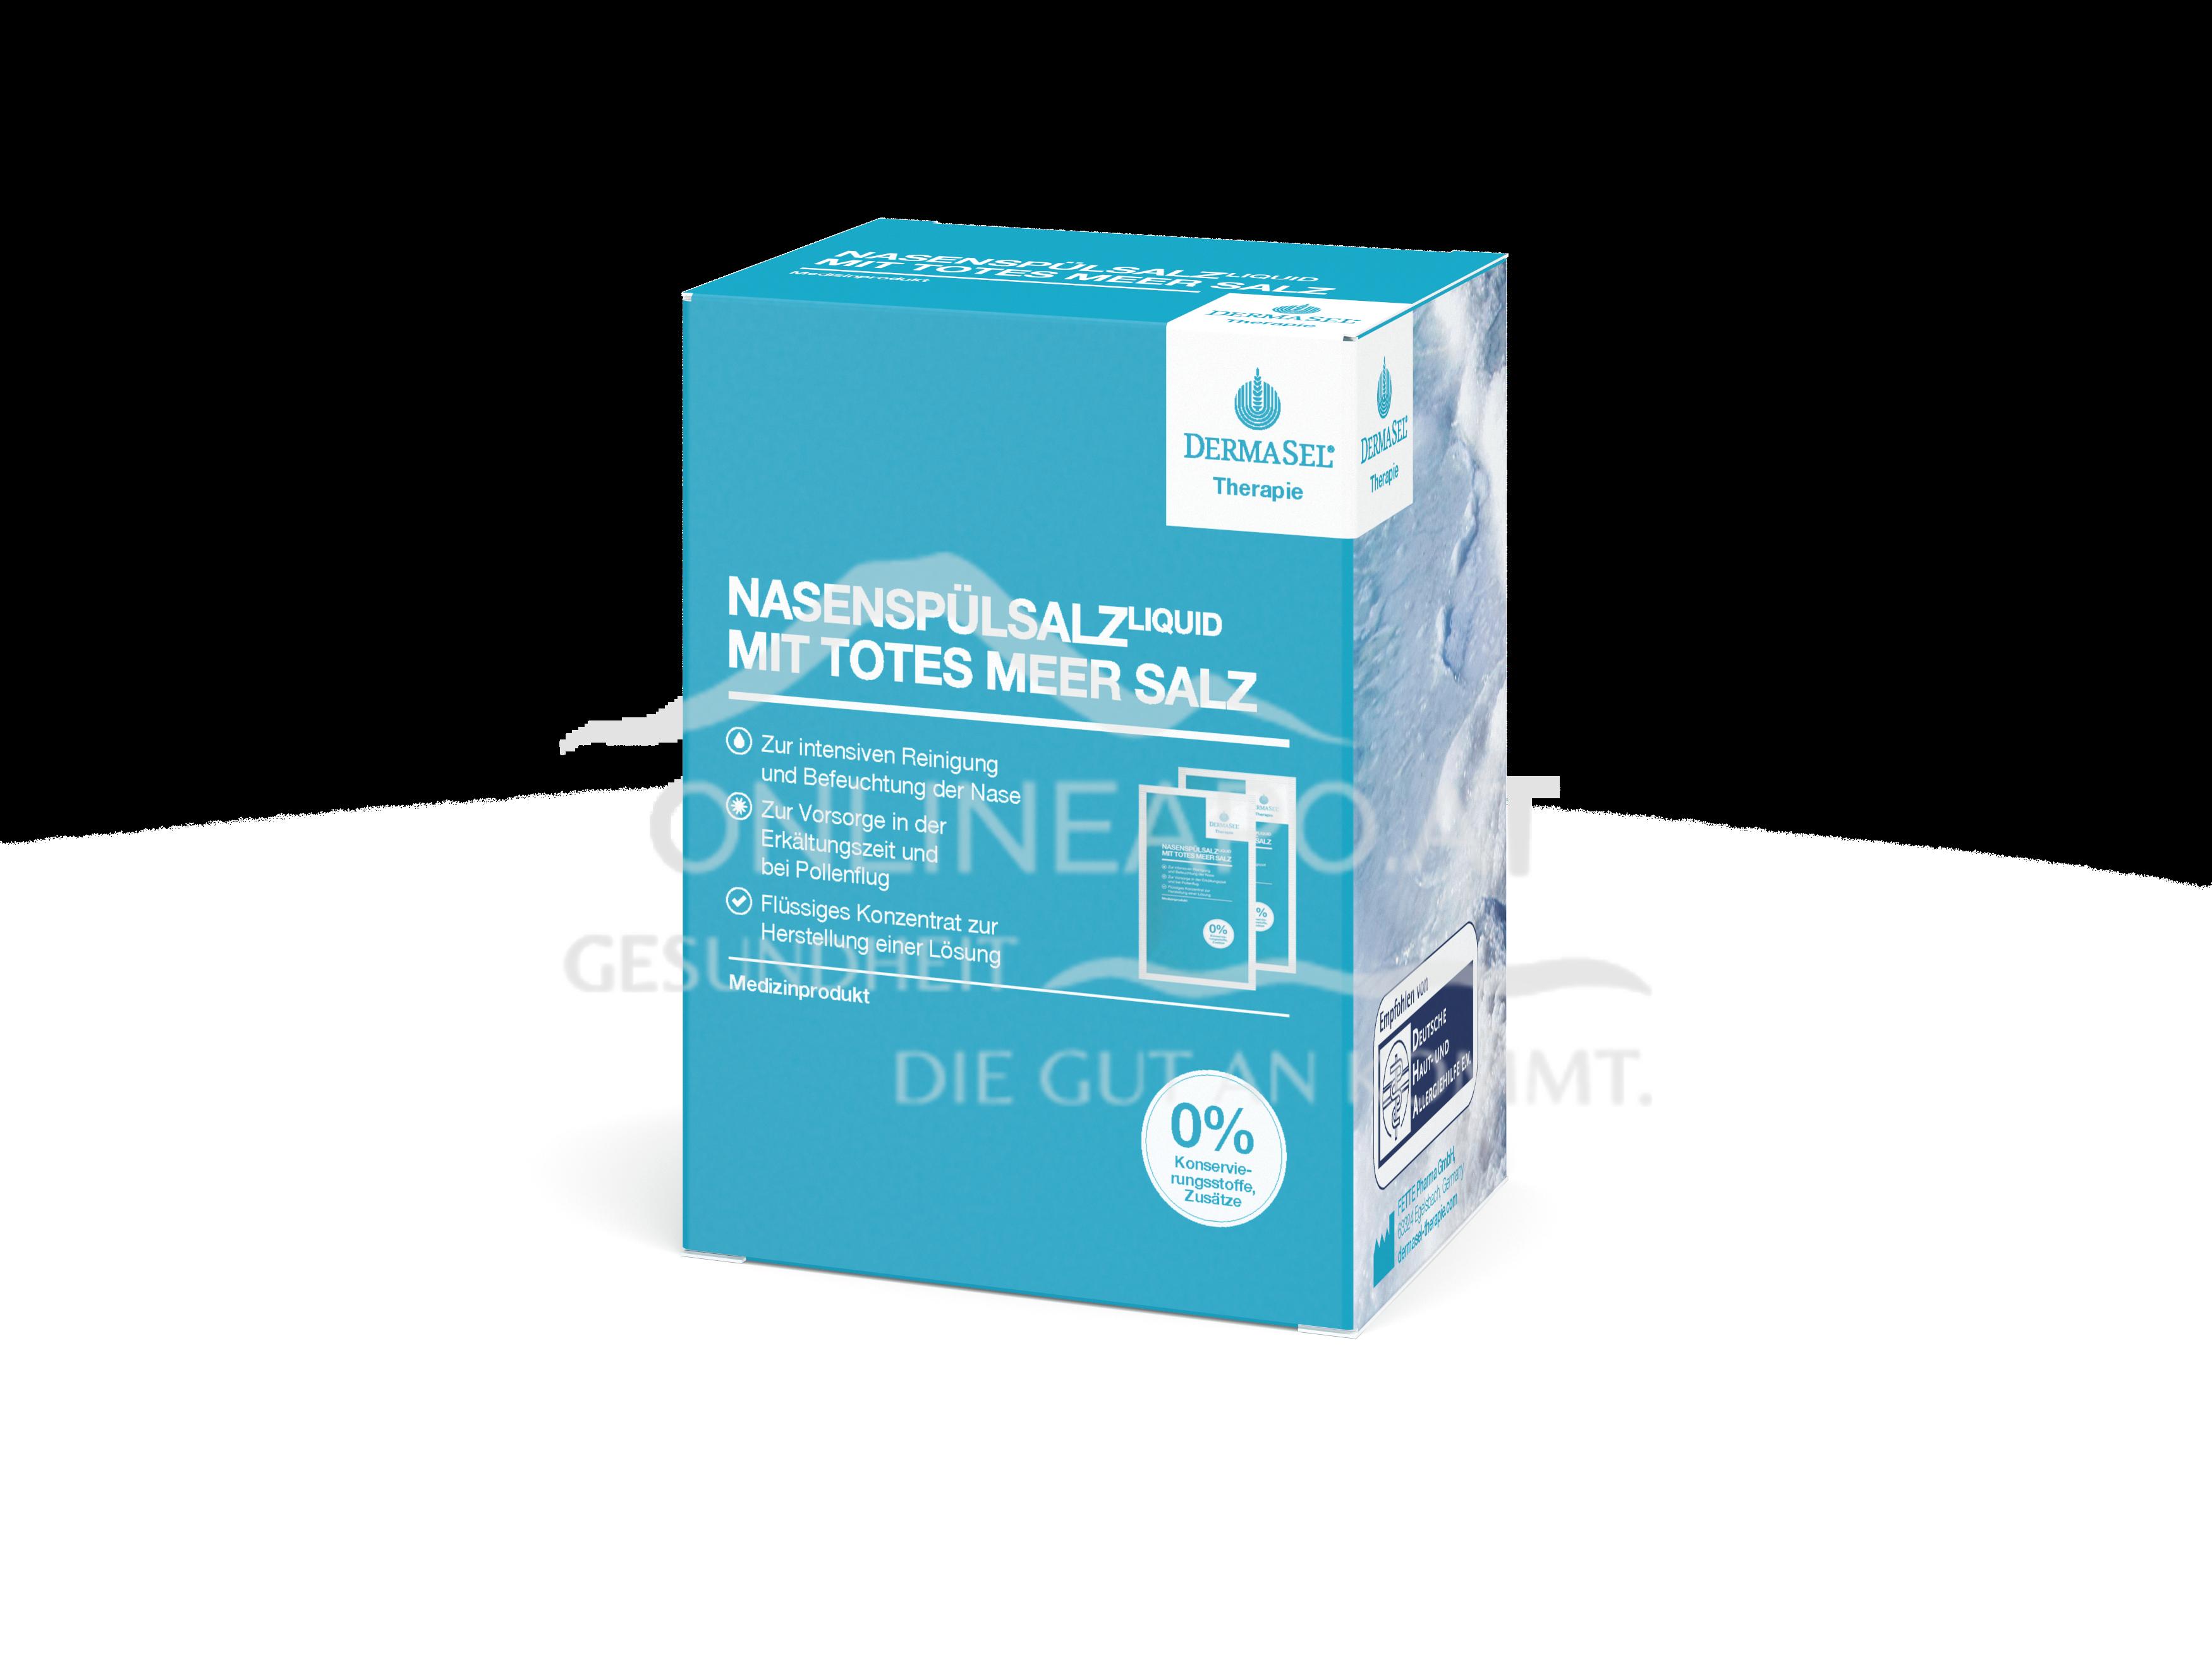 DermaSel® Therapie NasenspülsalzLIQUID